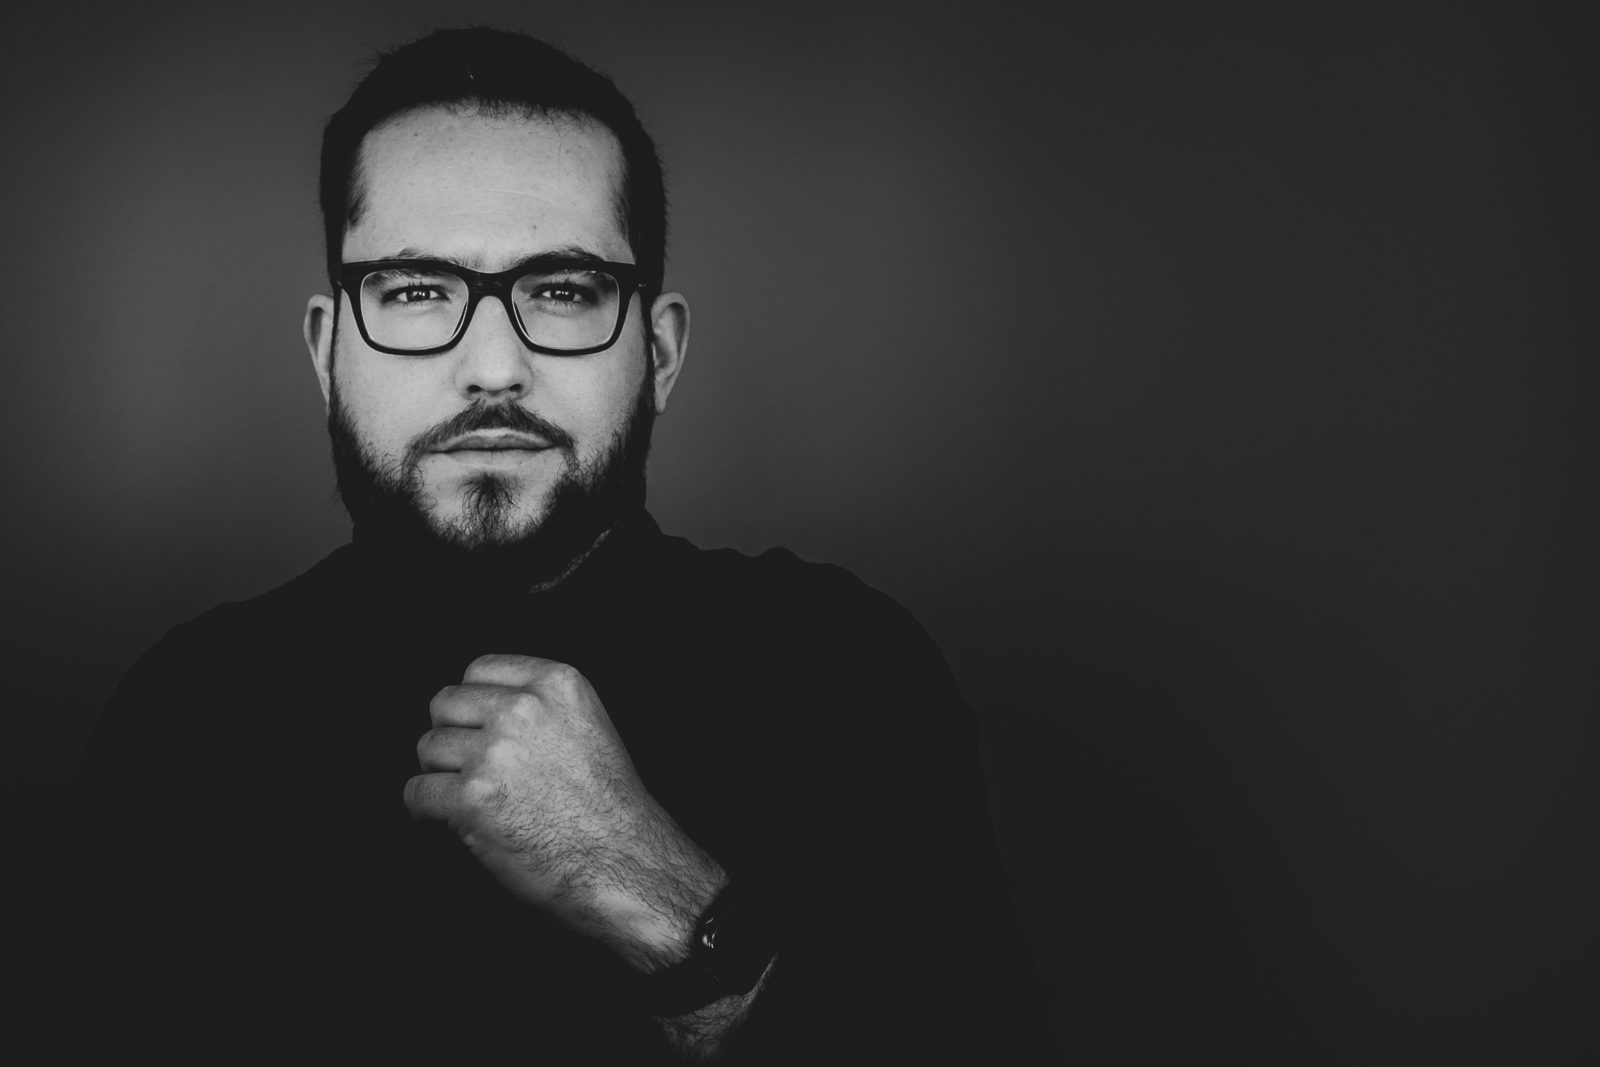 Matthias Dobbelaere-Welvaert